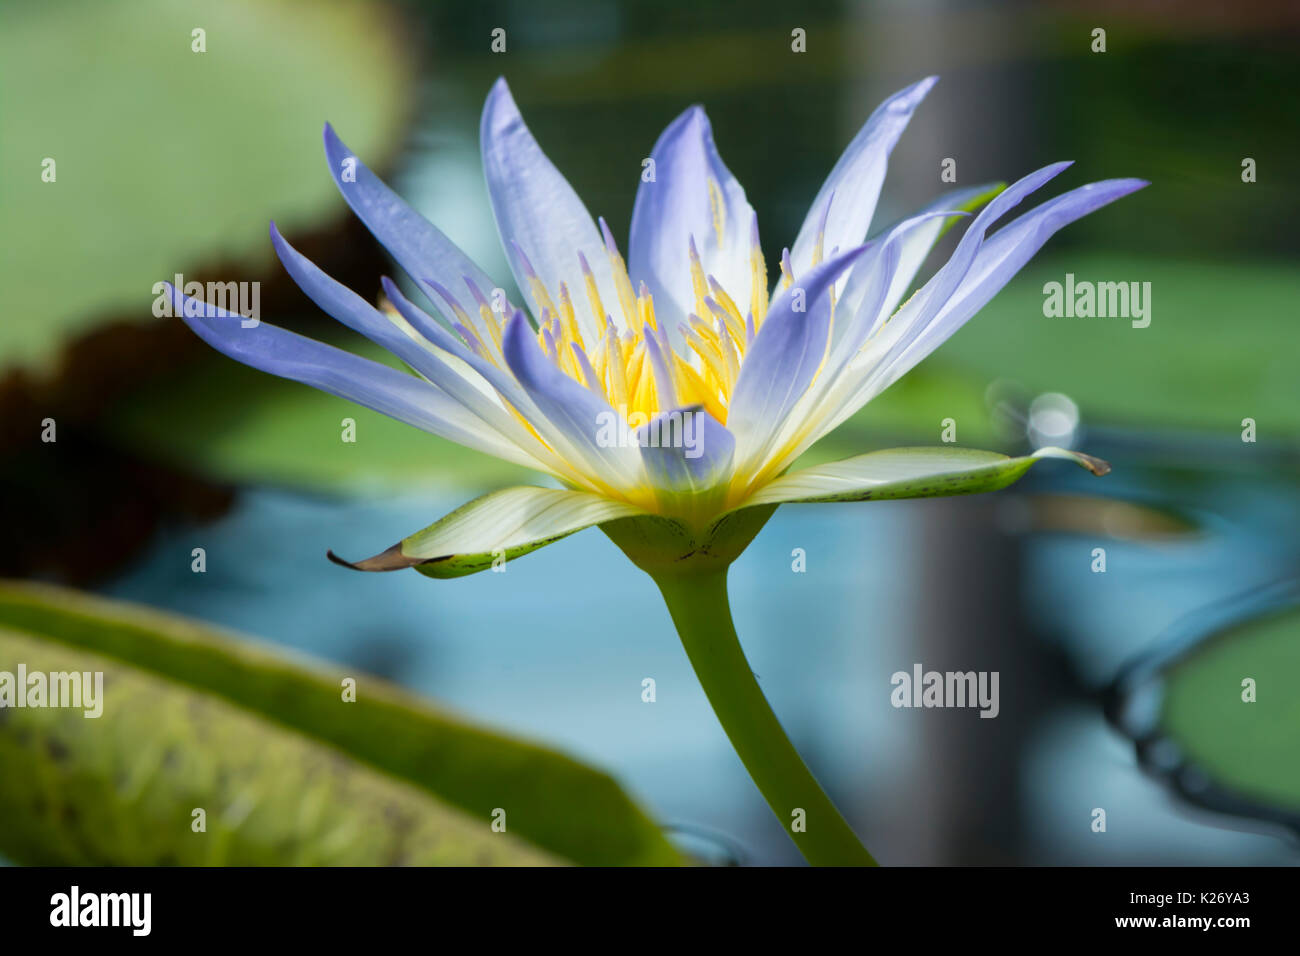 A Single Nymphaea Caerulea Blue Lotus Of Egypt Flower Head In